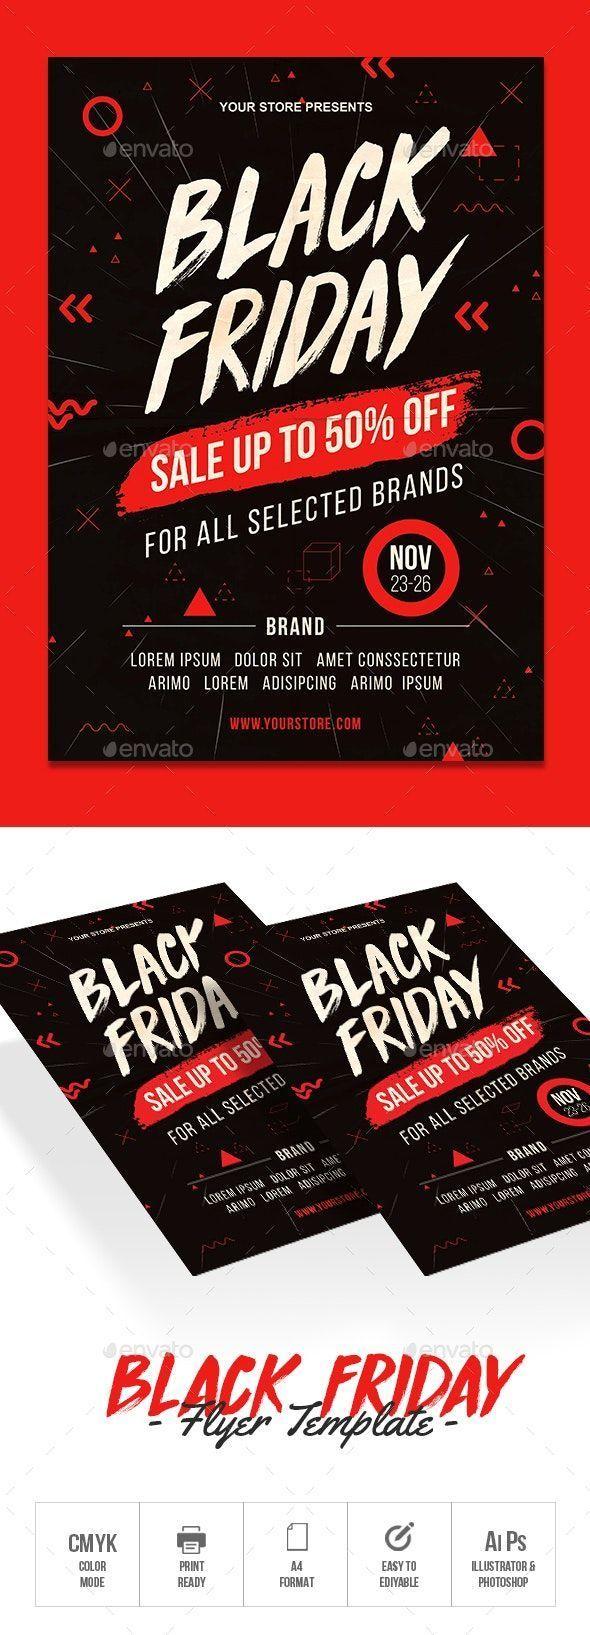 Black Friday 2020 Australia